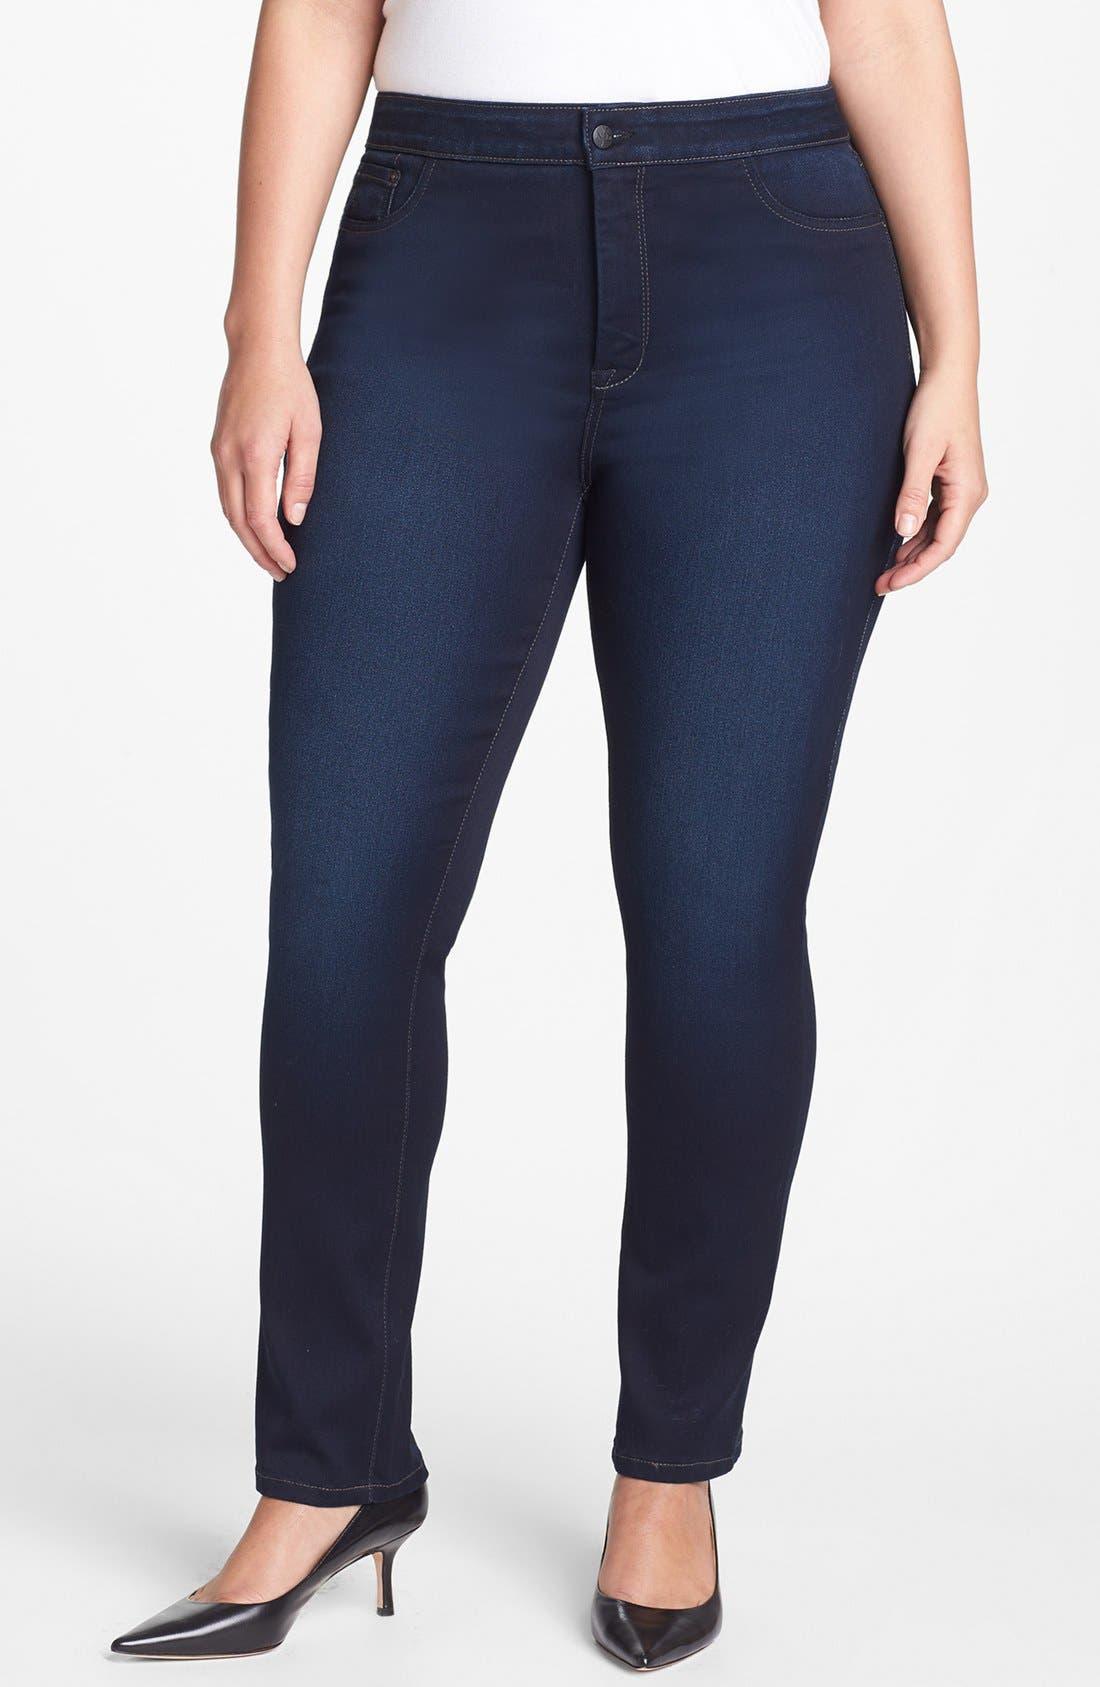 Main Image - NYDJ 'Jaclyn' Stretch Skinny Jeans (Pasadena) (Plus Size)